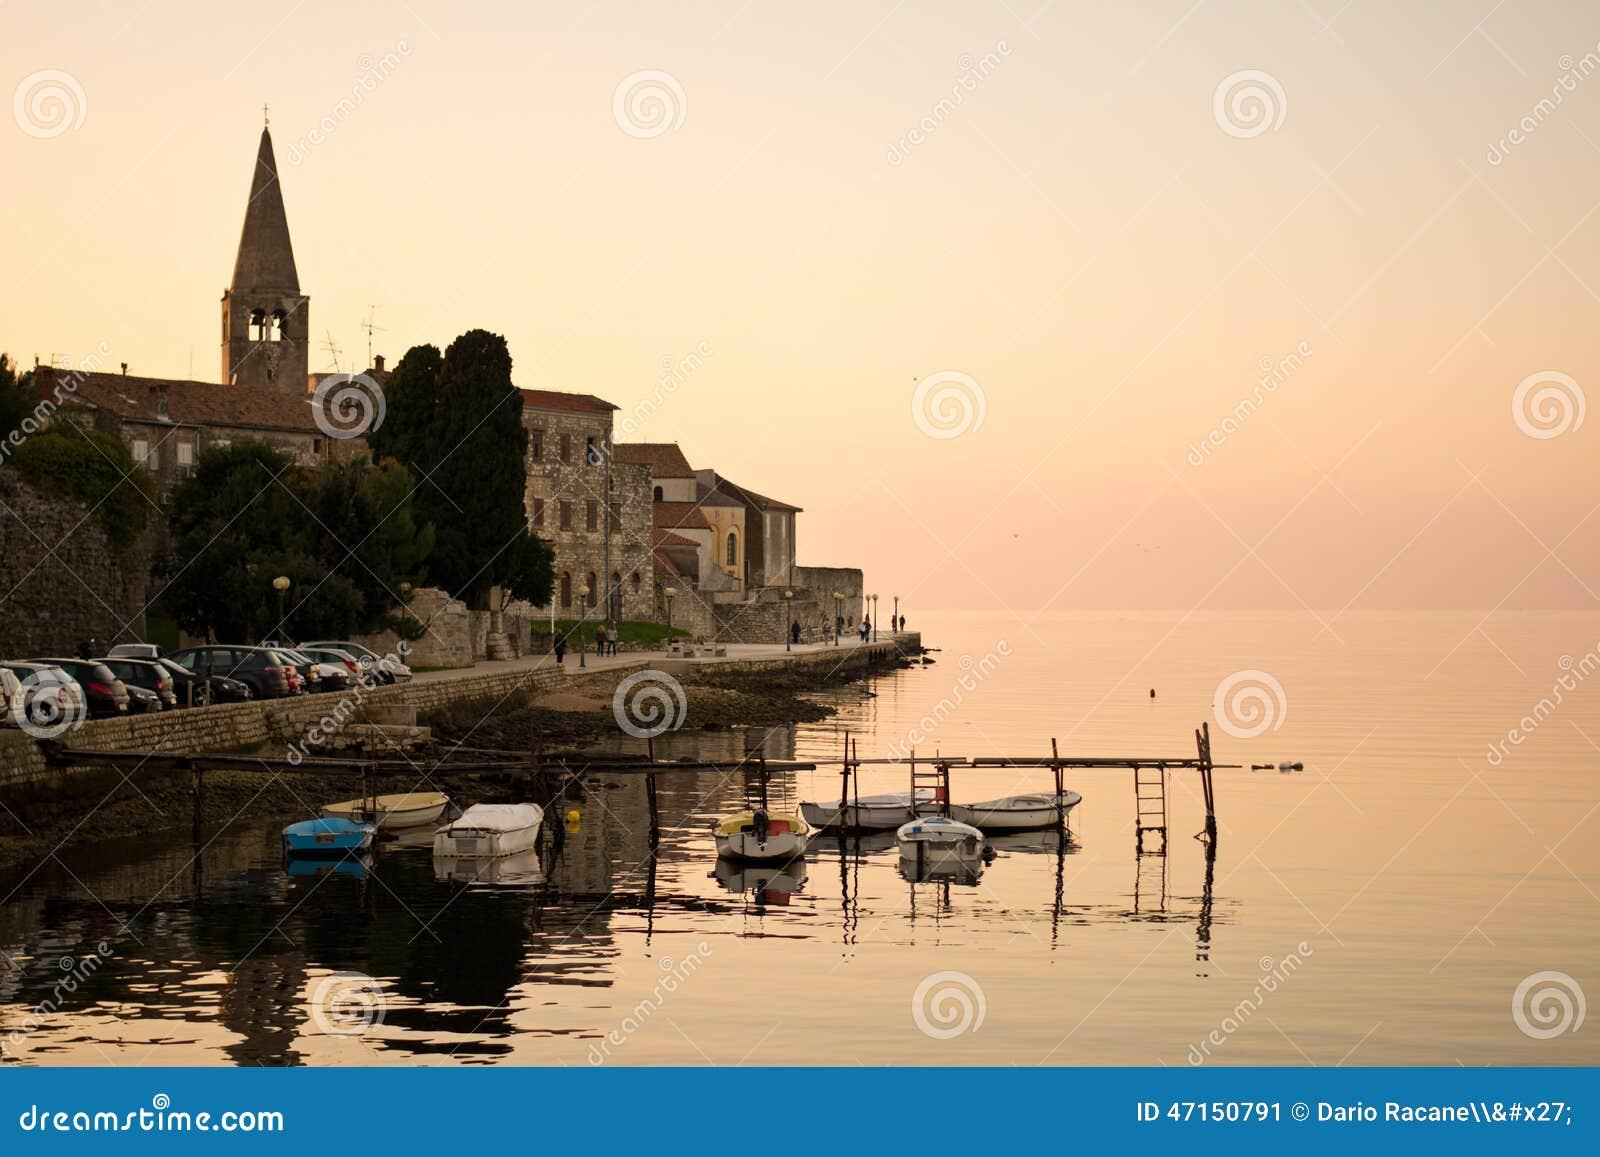 Automne dans Porec, Croatie